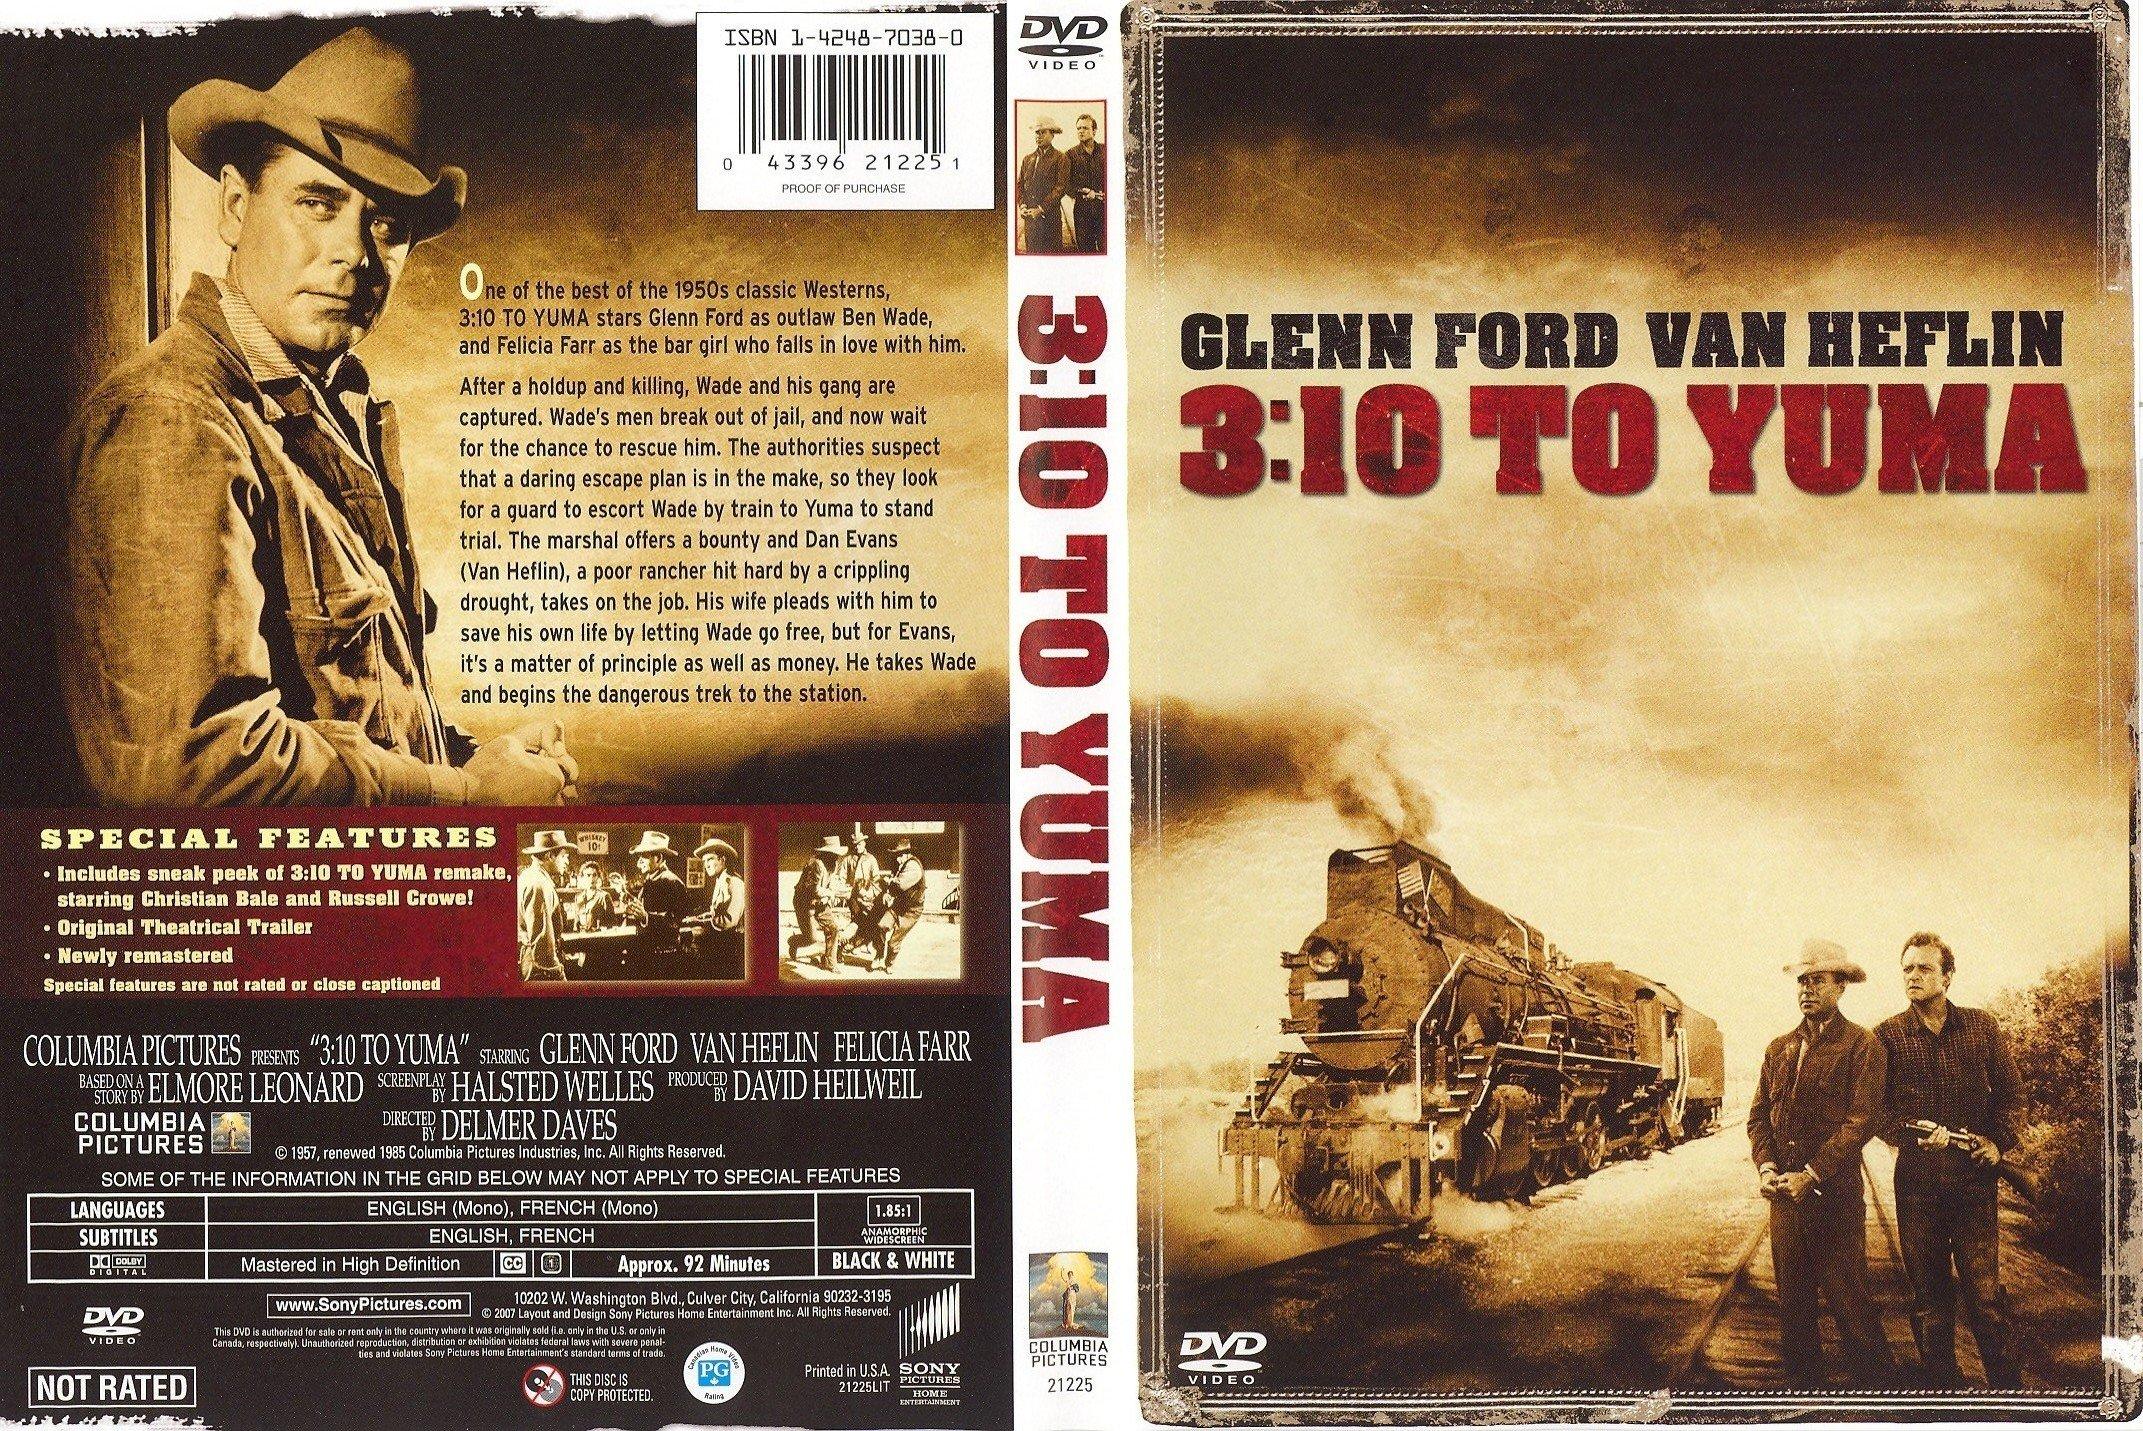 Covers Box Sk 3 10 To Yuma 1957 High Quality Dvd